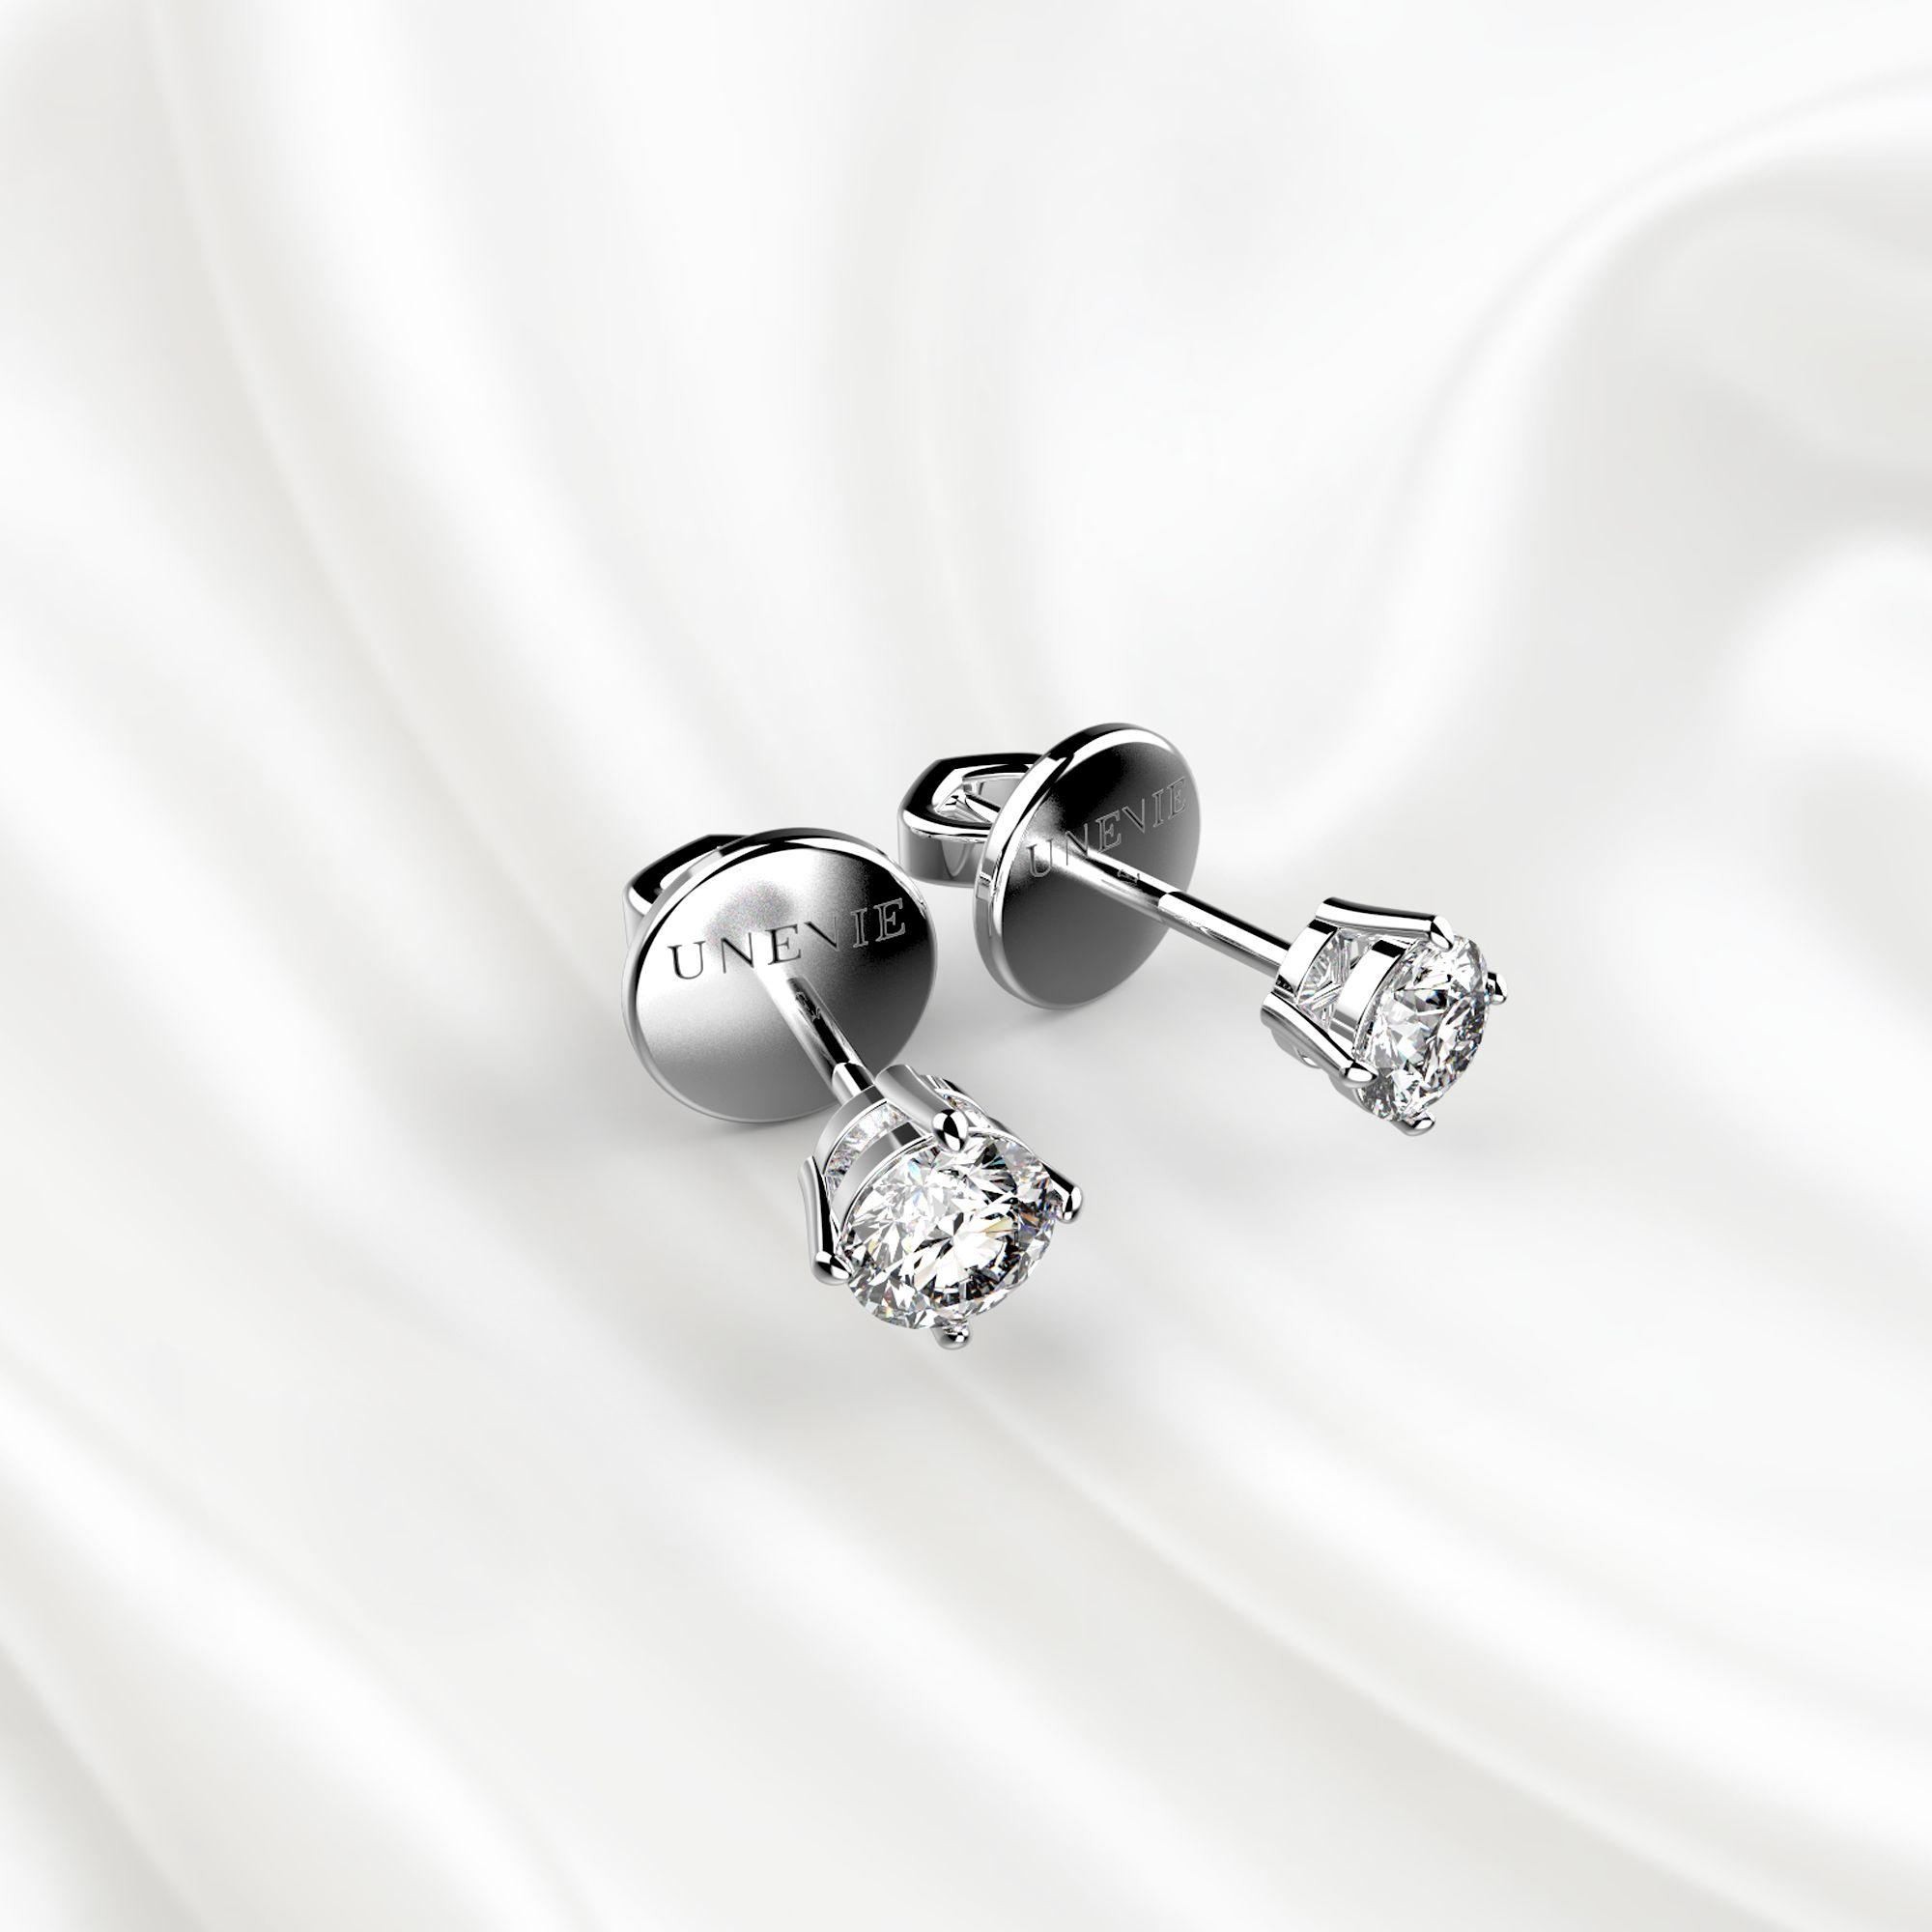 S3 Серьги-пусеты с бриллиантами 0,2 карат